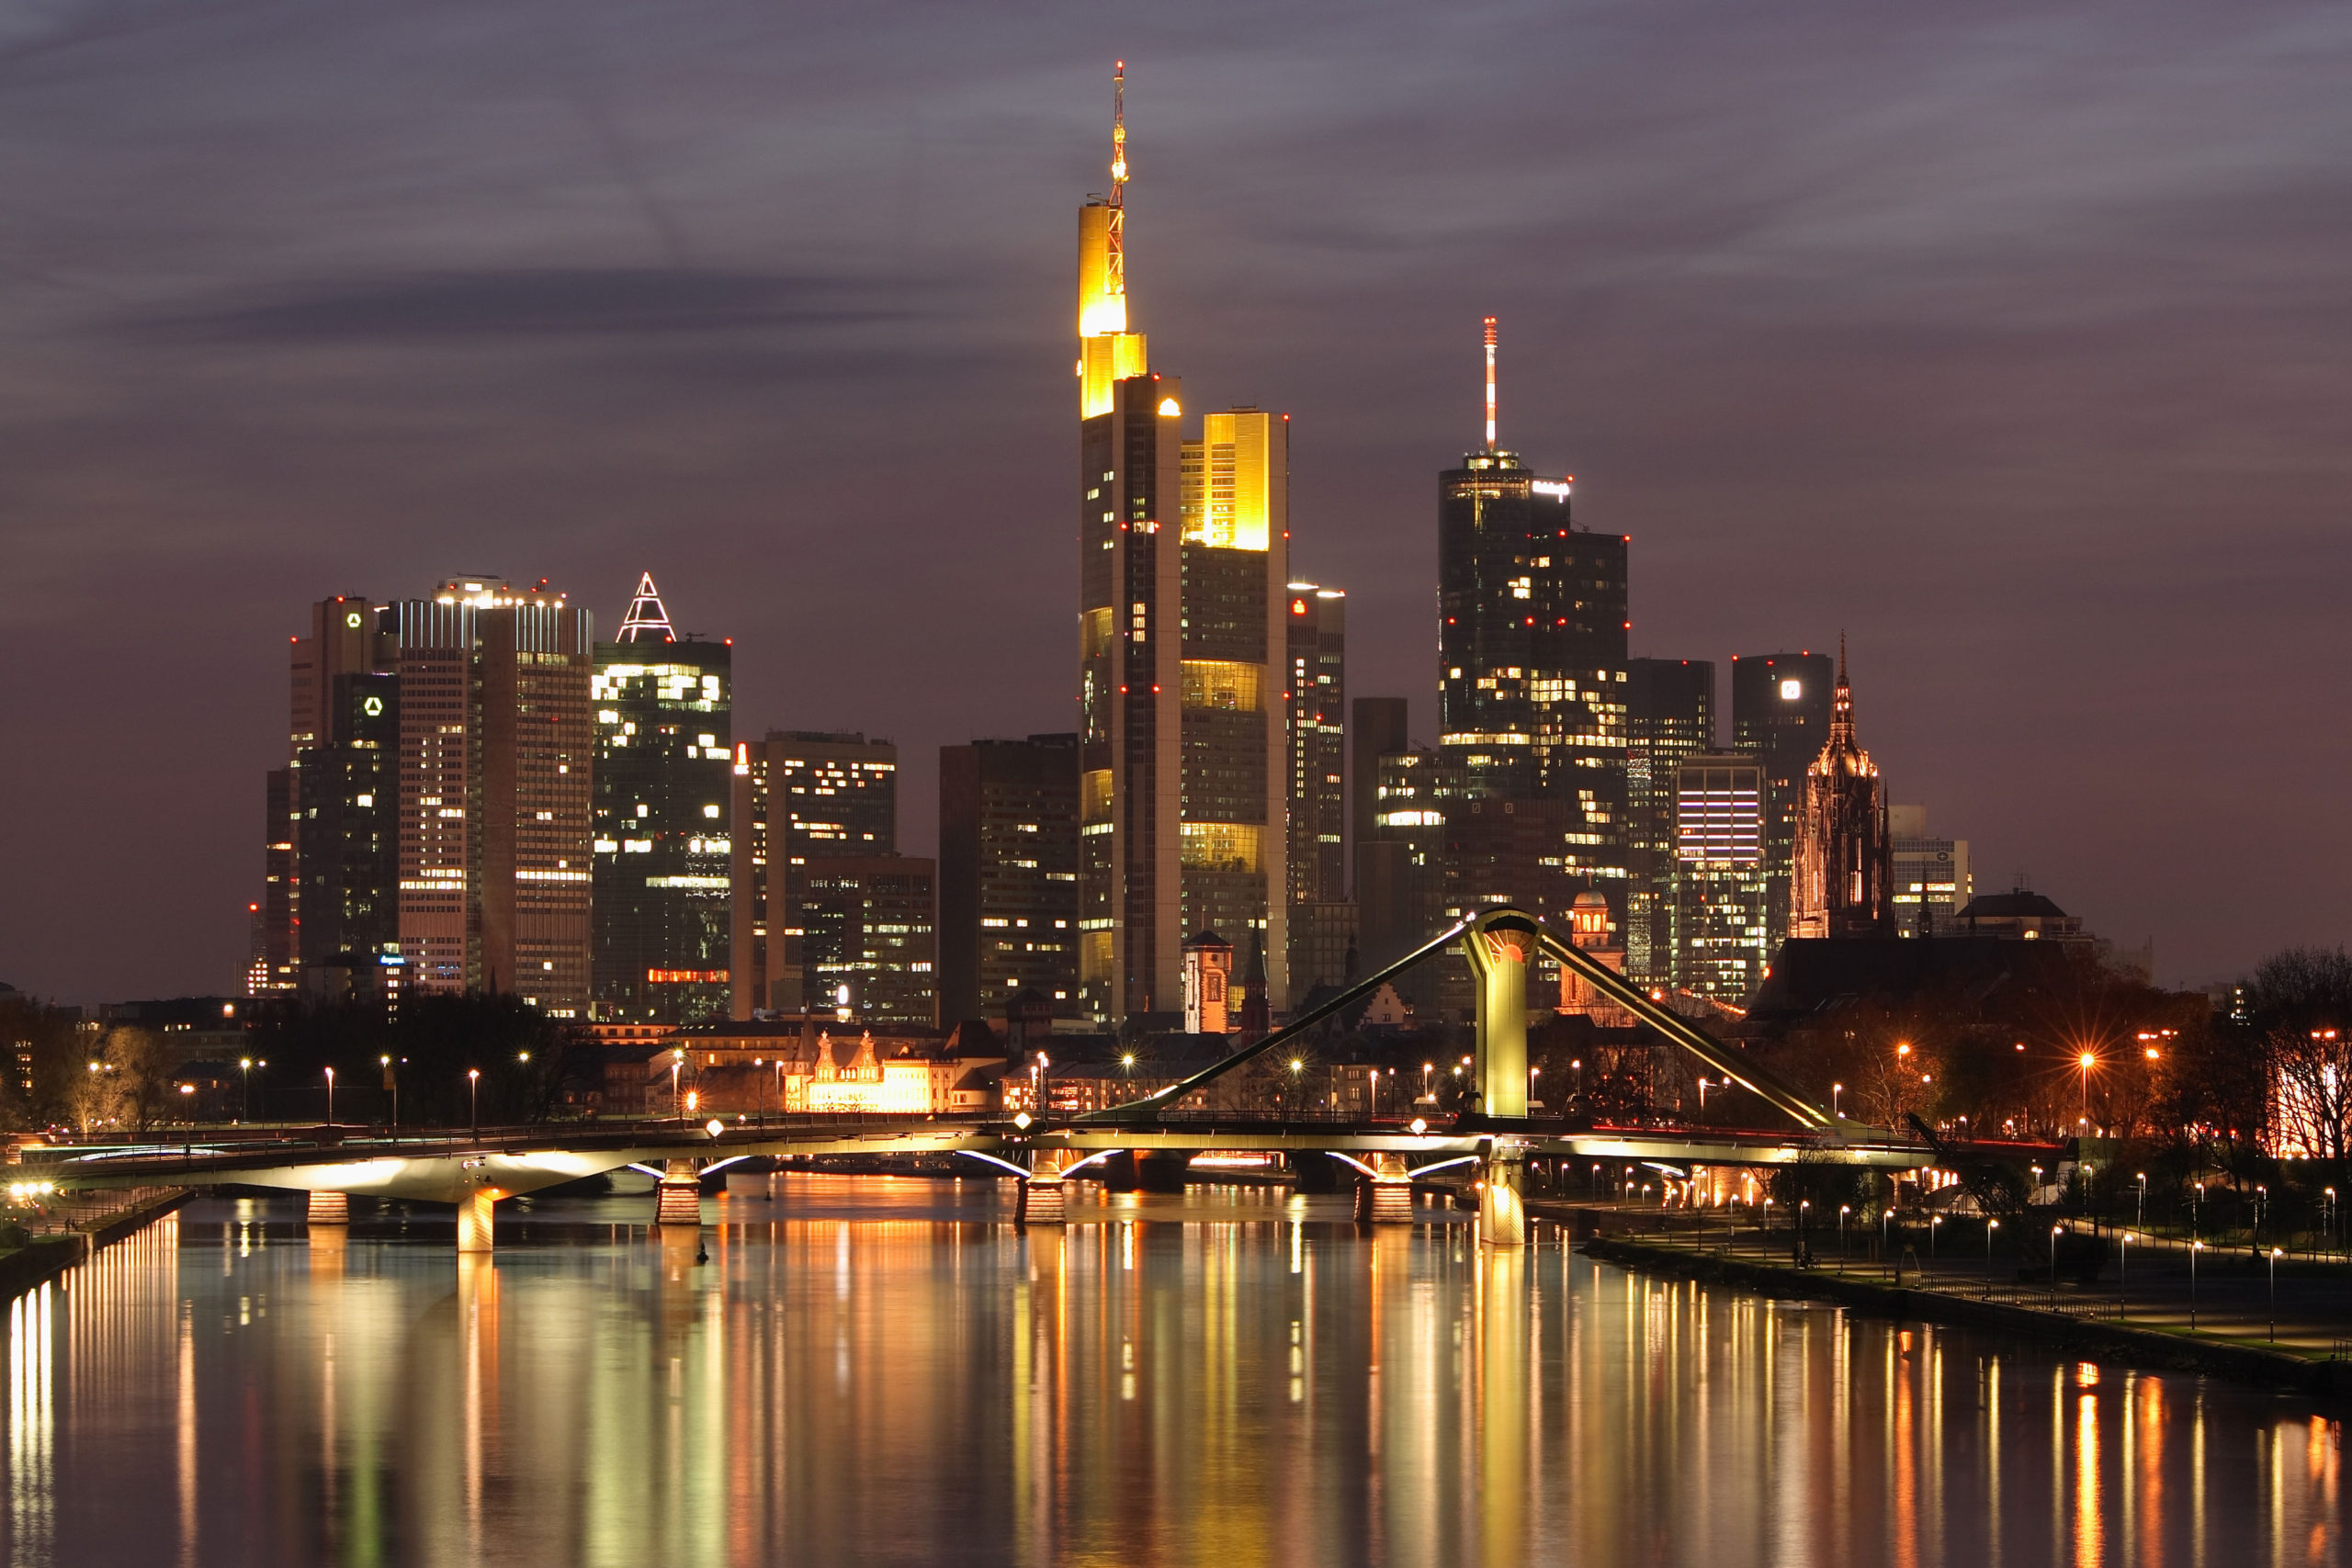 Frankfurt 1 scaled - أهم المدن والمعالم في ألمانيا